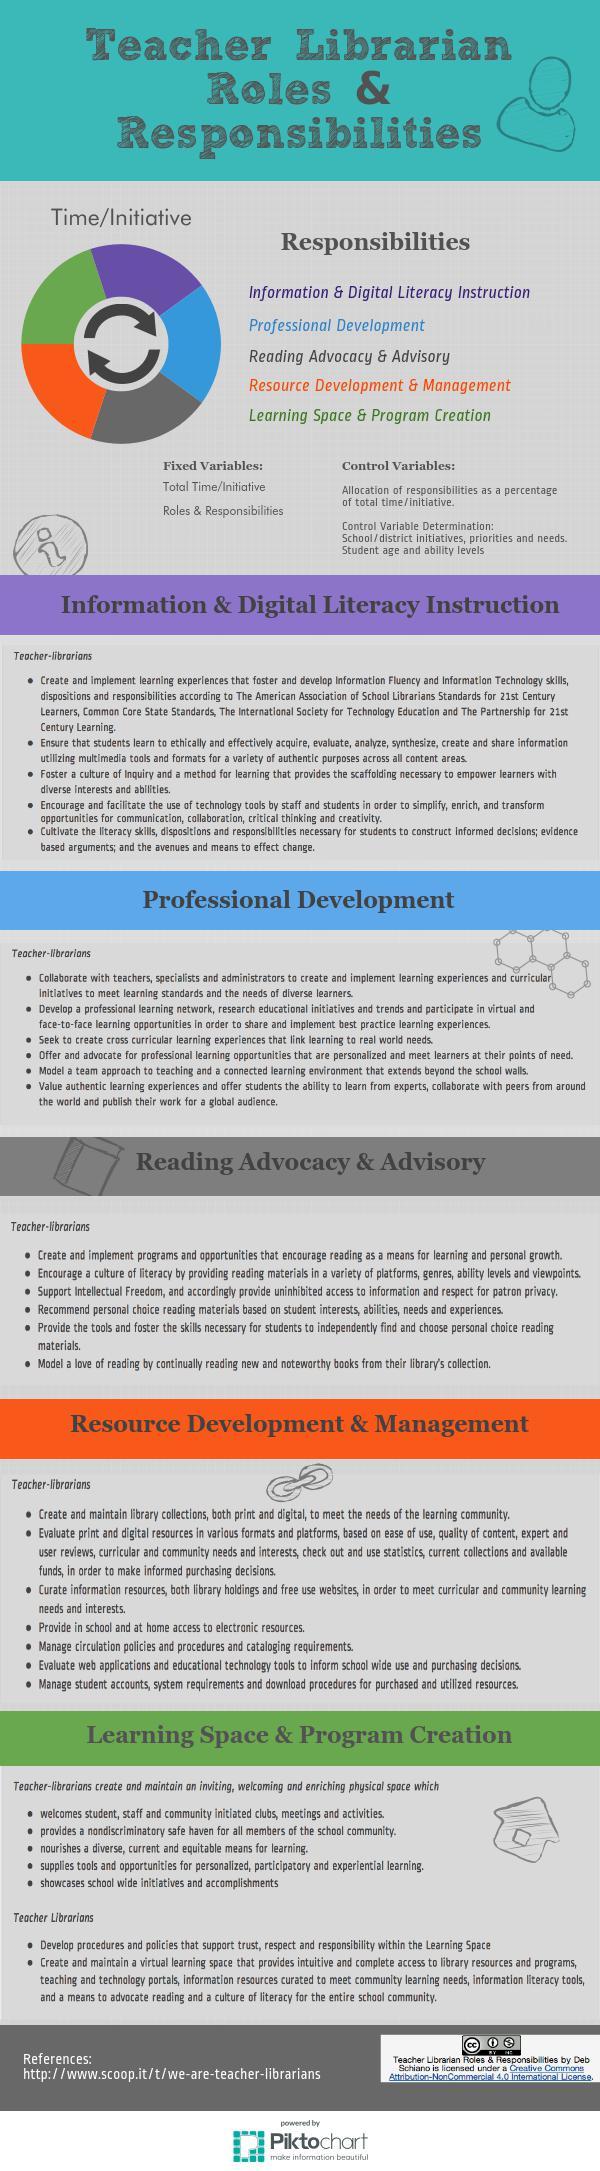 Collaborative Classroom Reading Curriculum ~ Teacher librarian roles piktochart visual editor